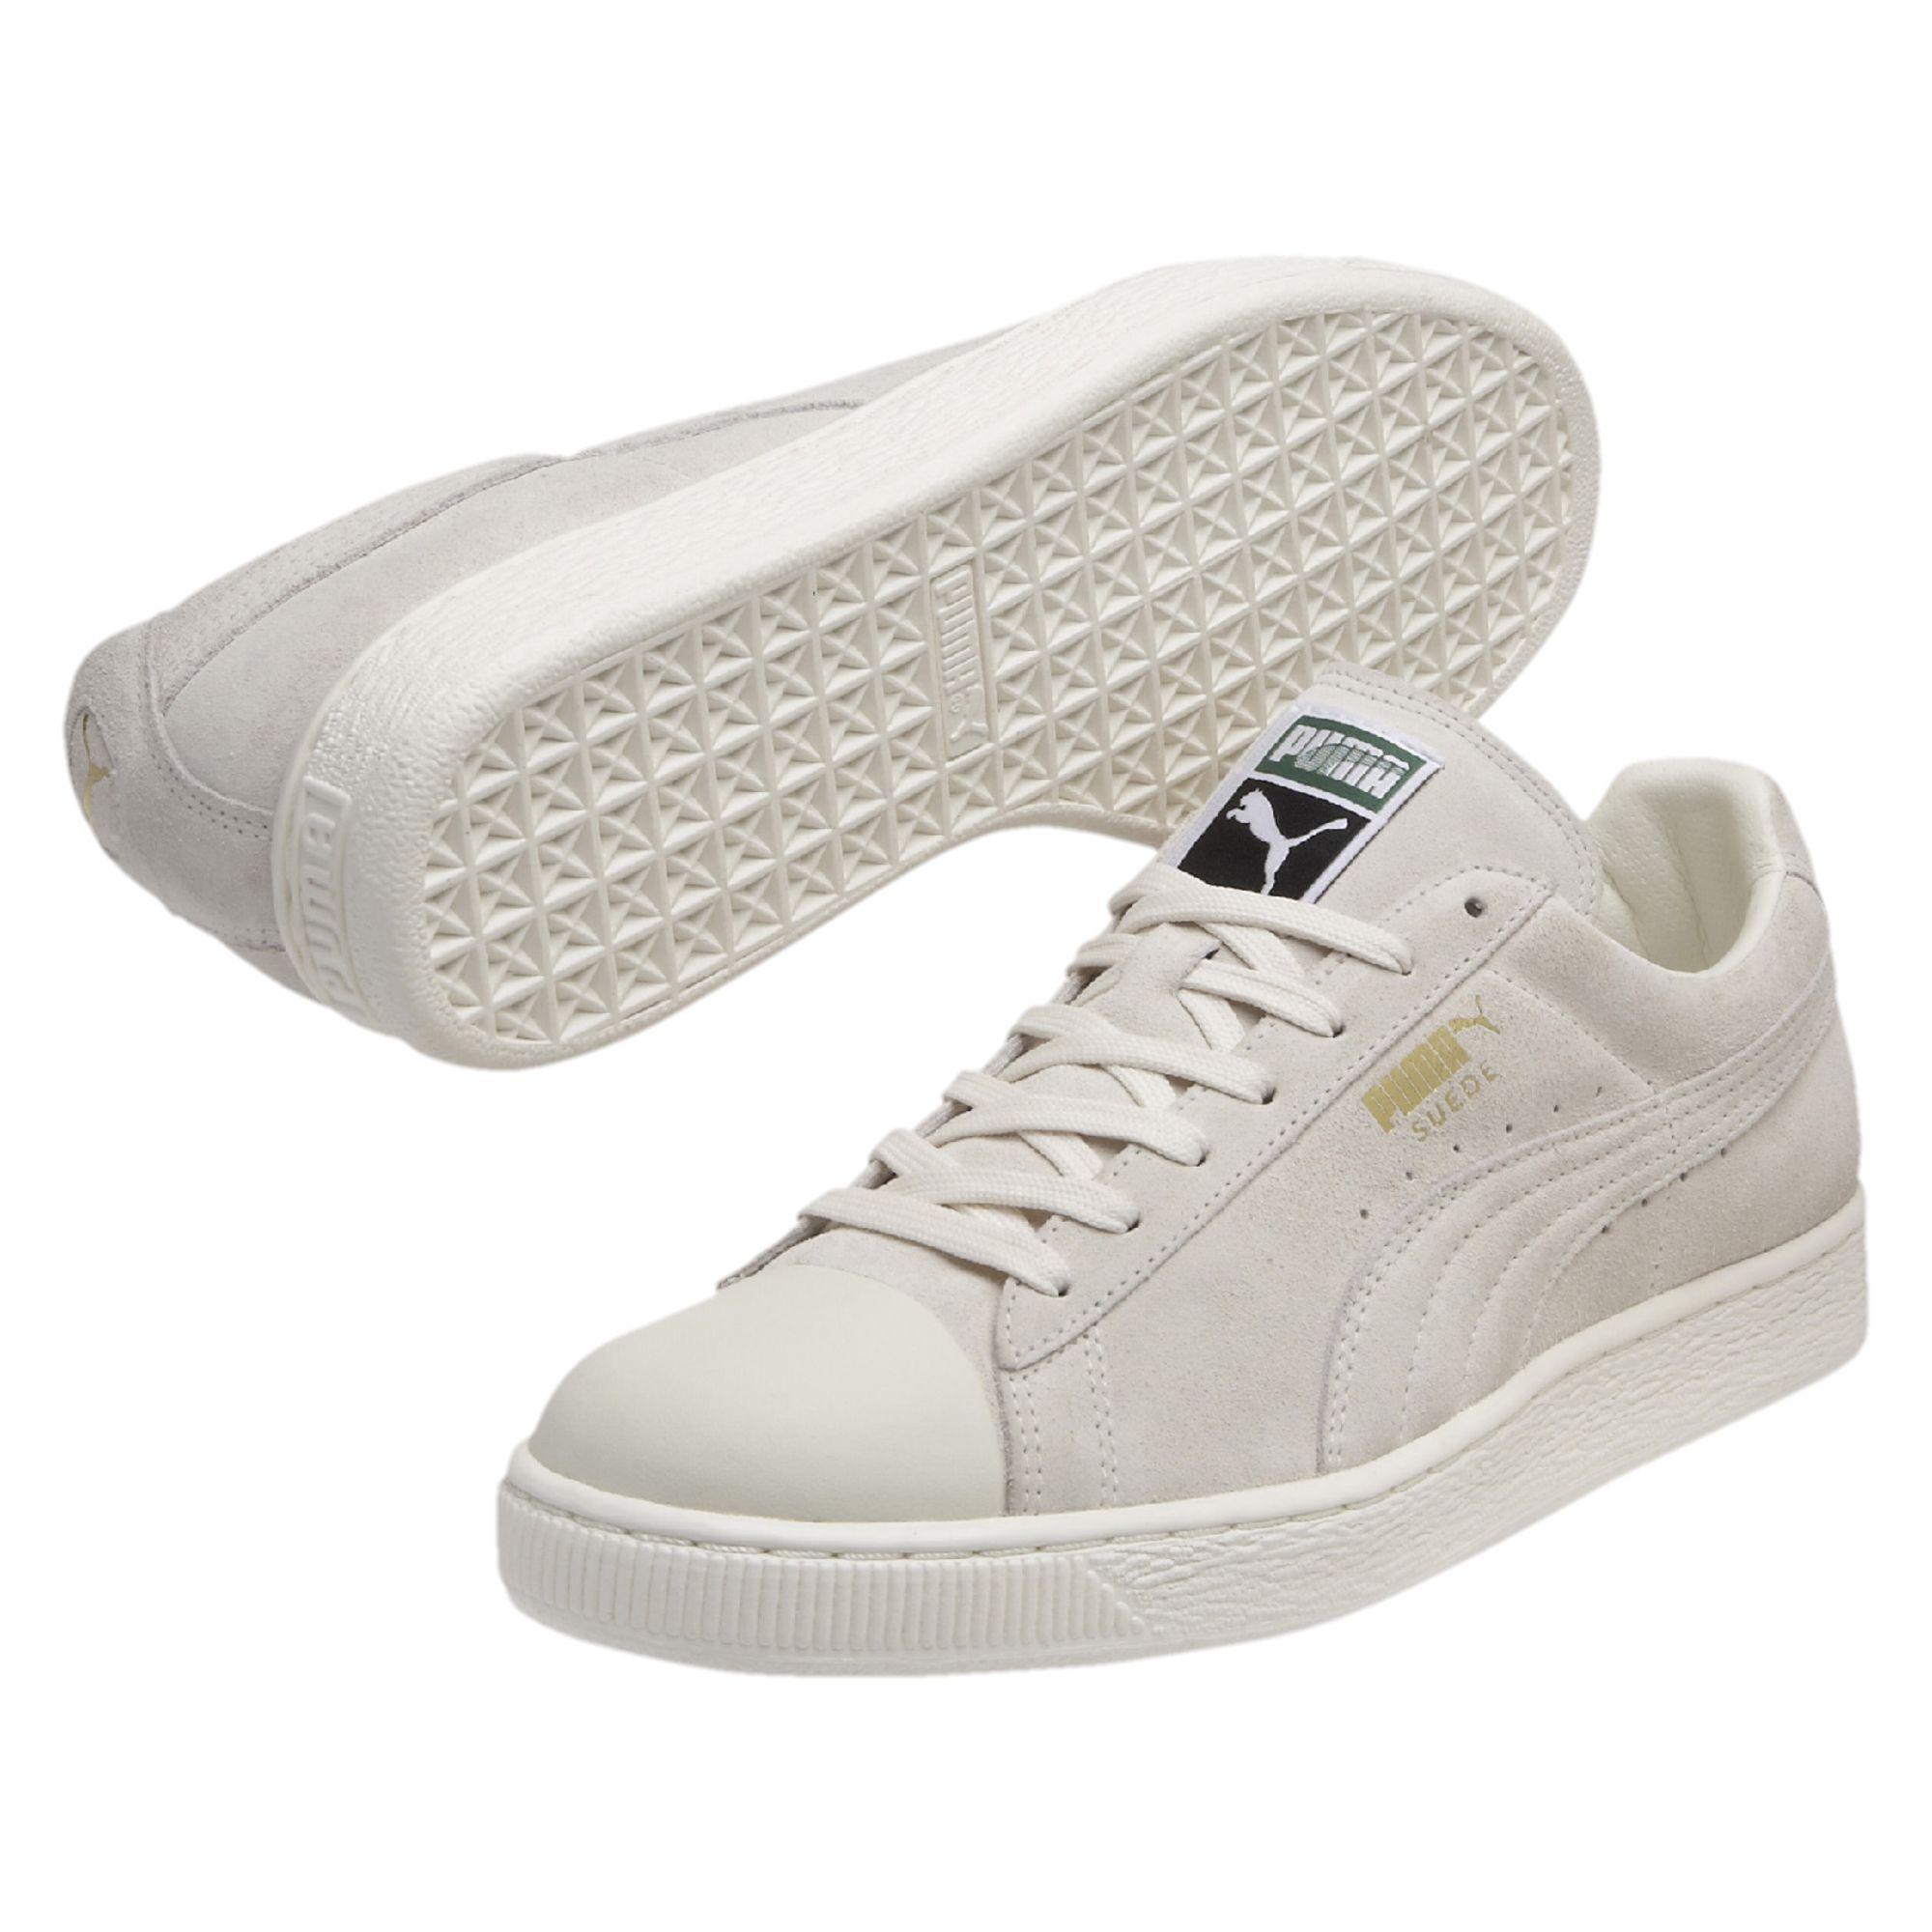 puma suede rubber toe sneaker schuhe sneakers sport classics unisex neu ebay. Black Bedroom Furniture Sets. Home Design Ideas